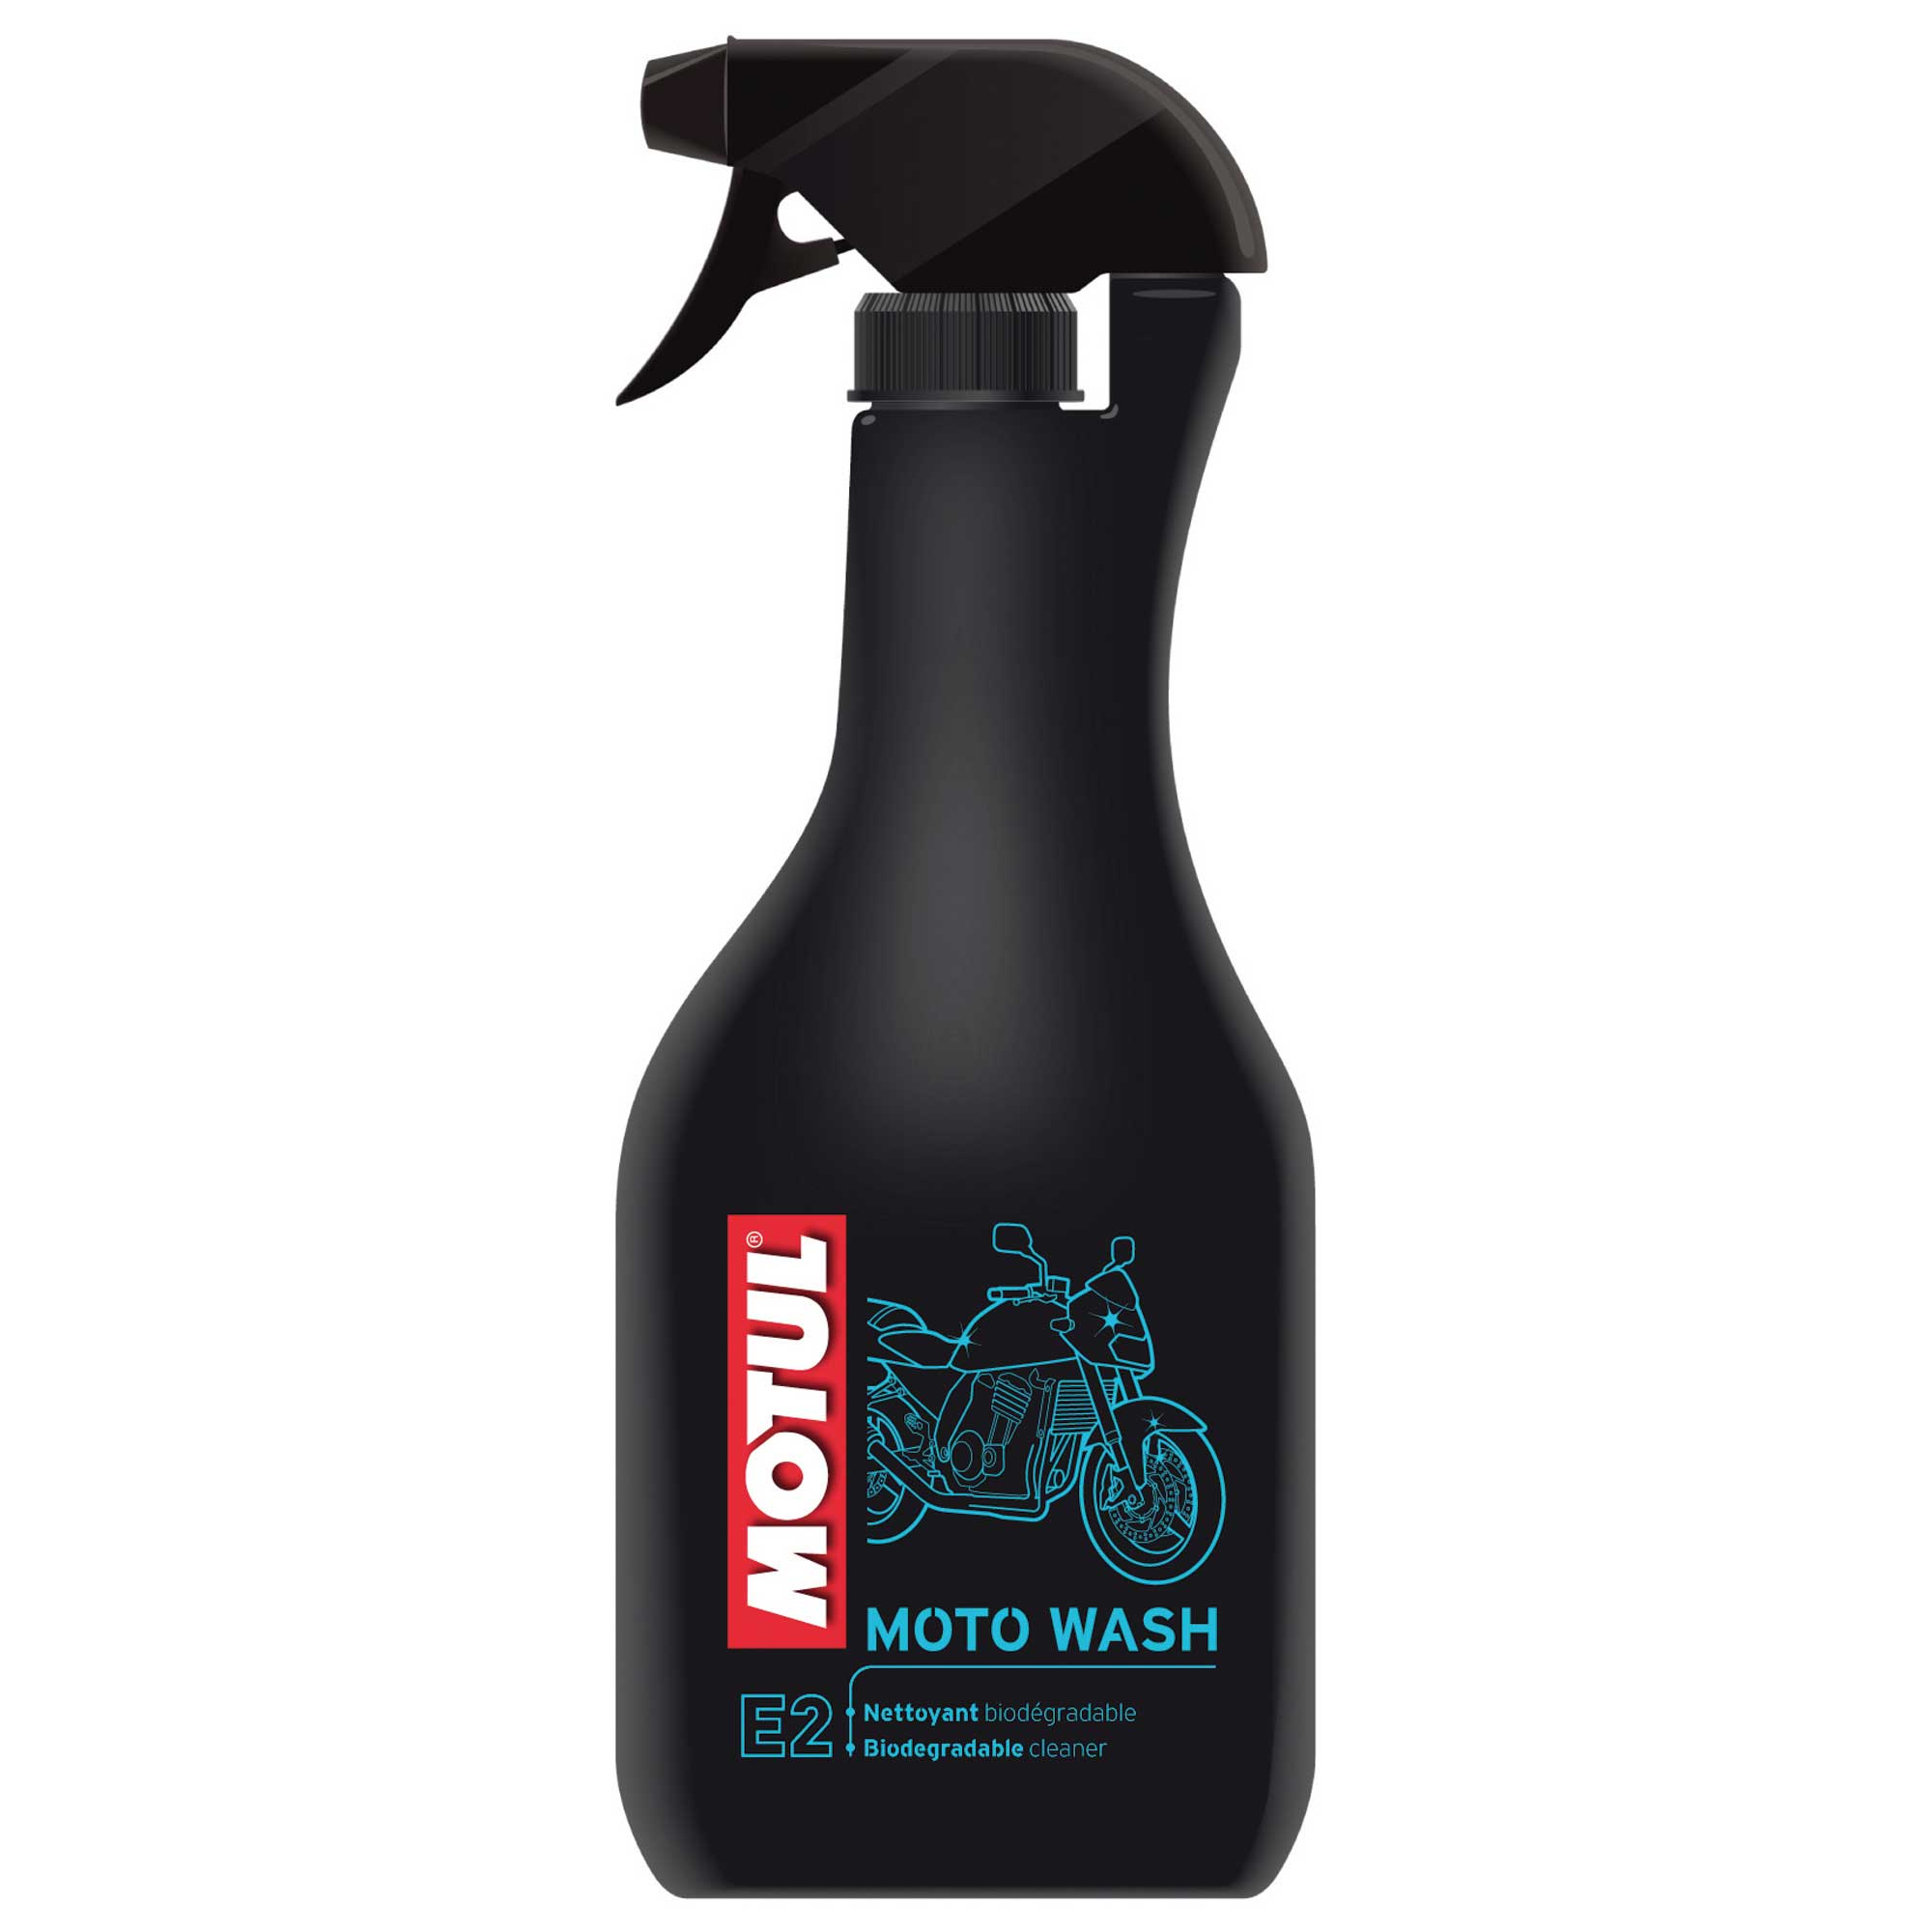 Шампунь для мотоцикла Motul E2 Moto Wash 1л